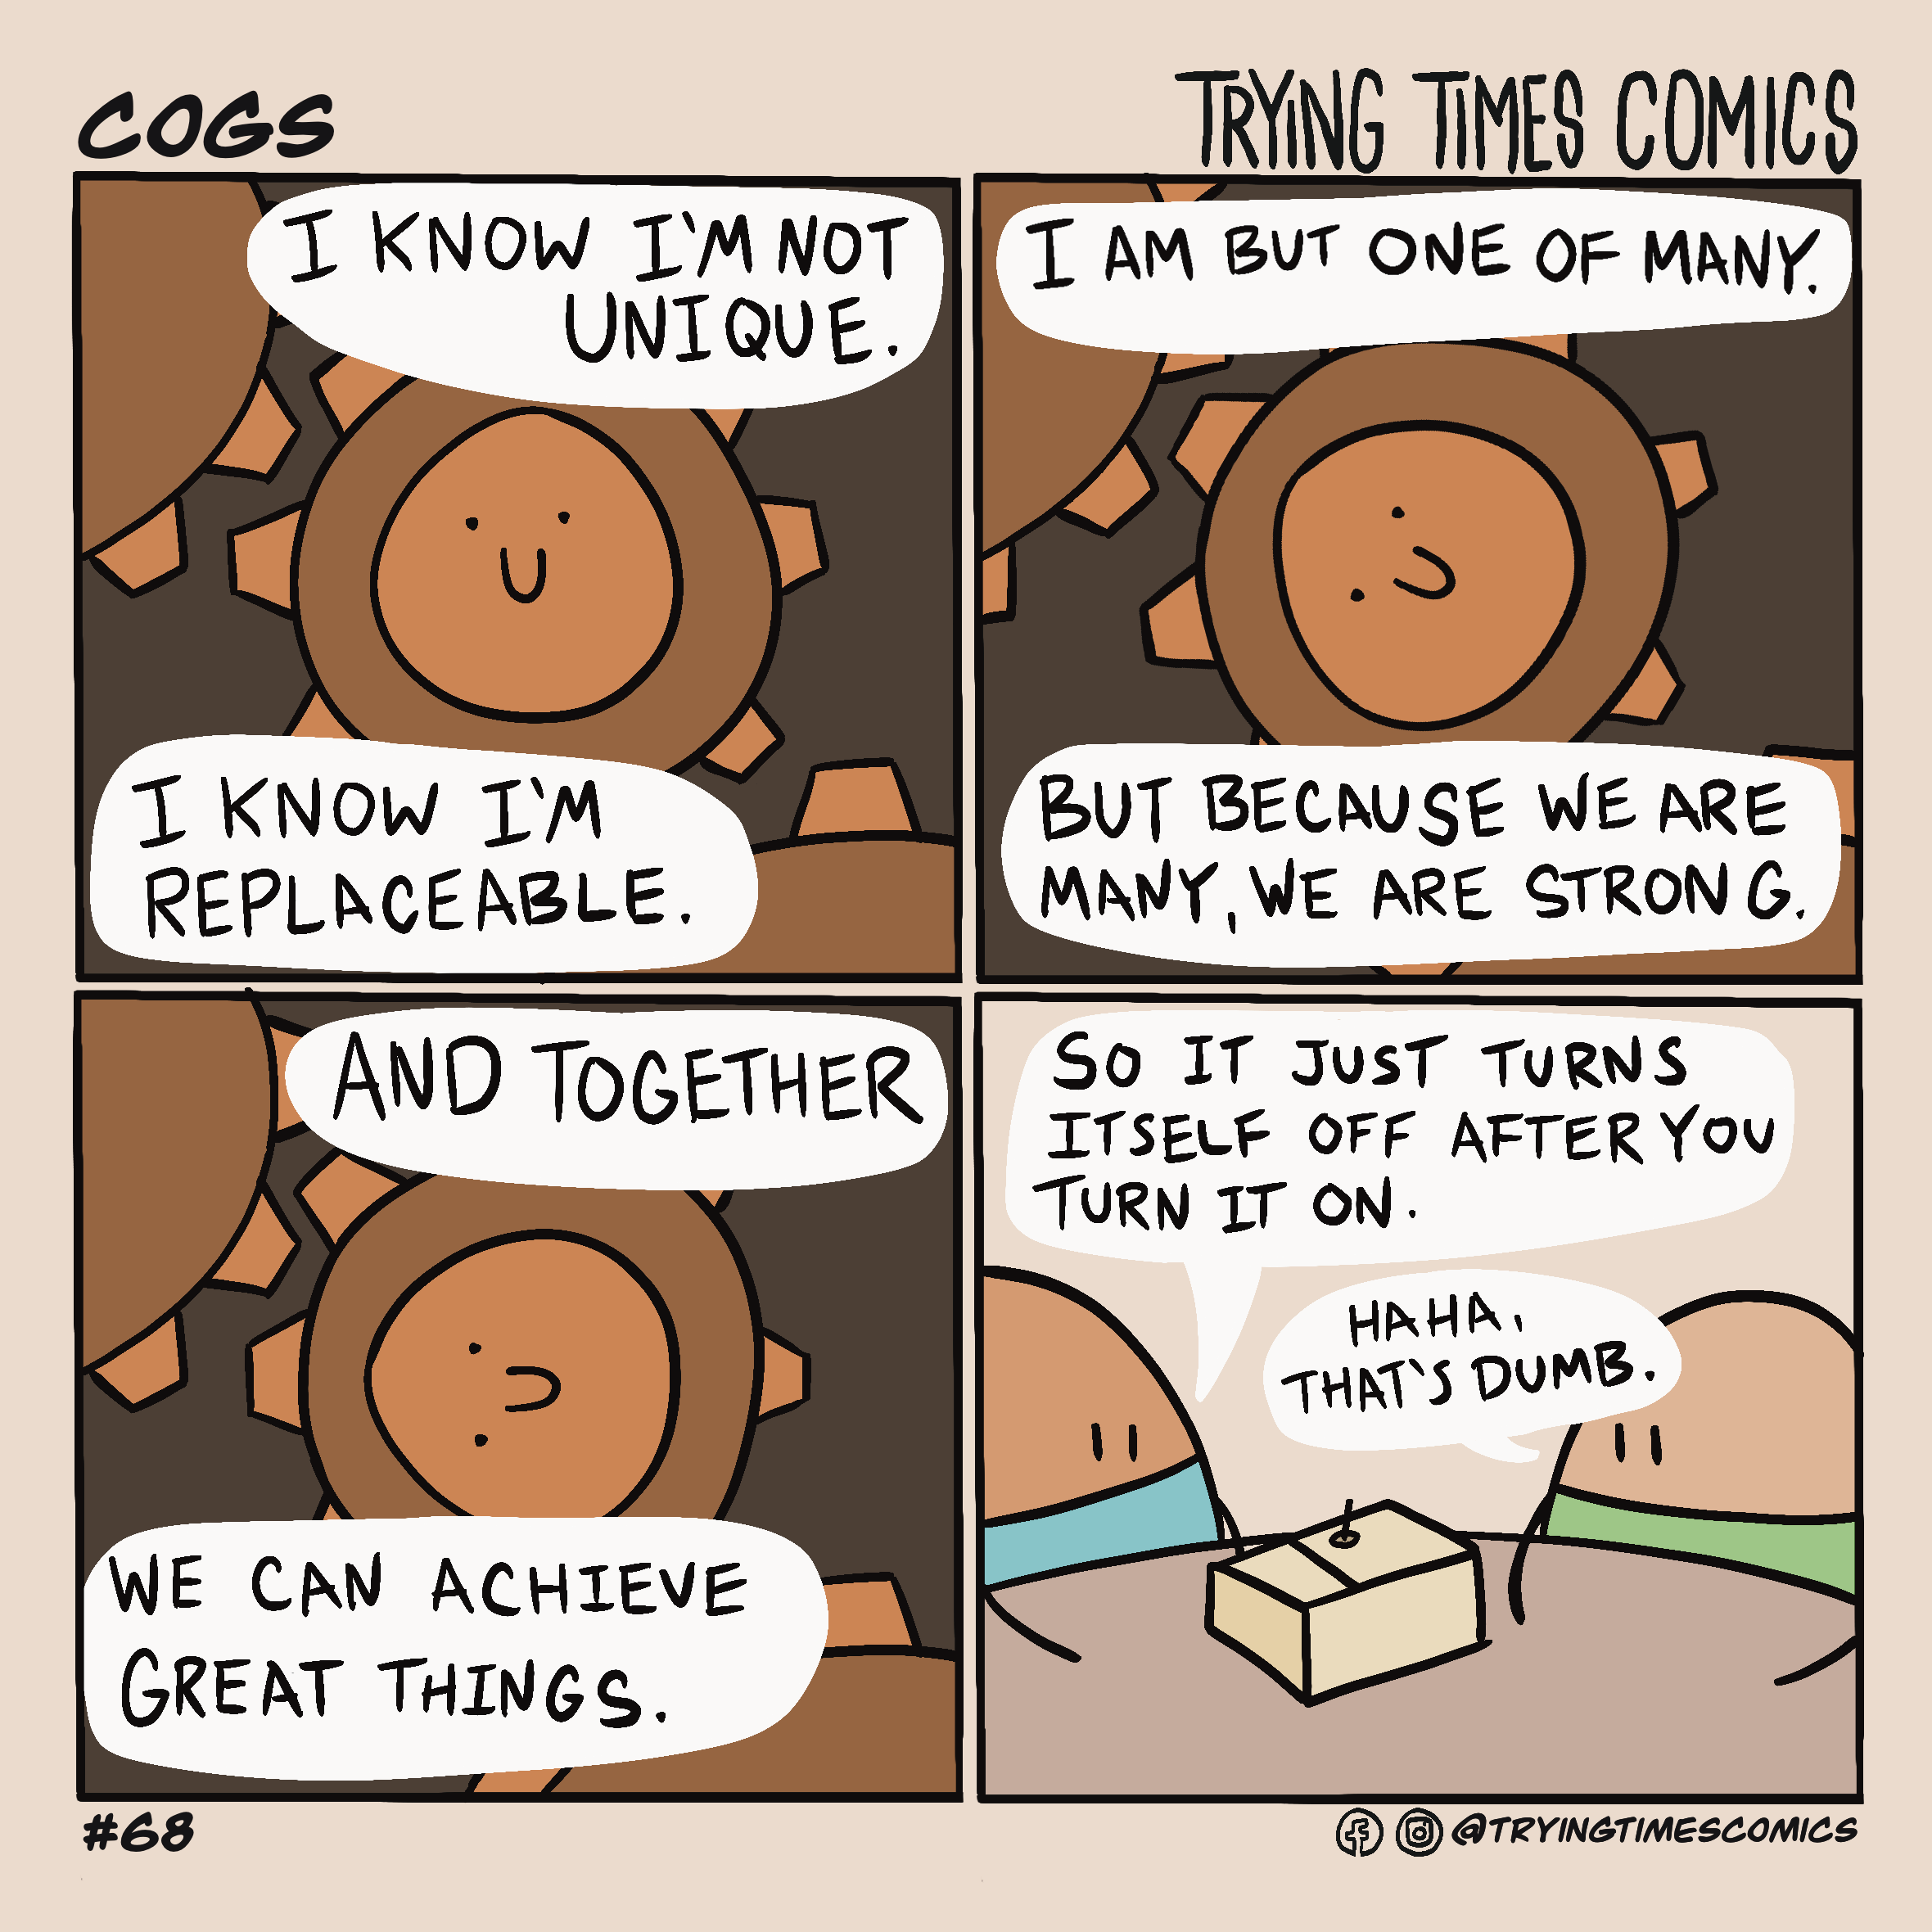 Just keep spinning